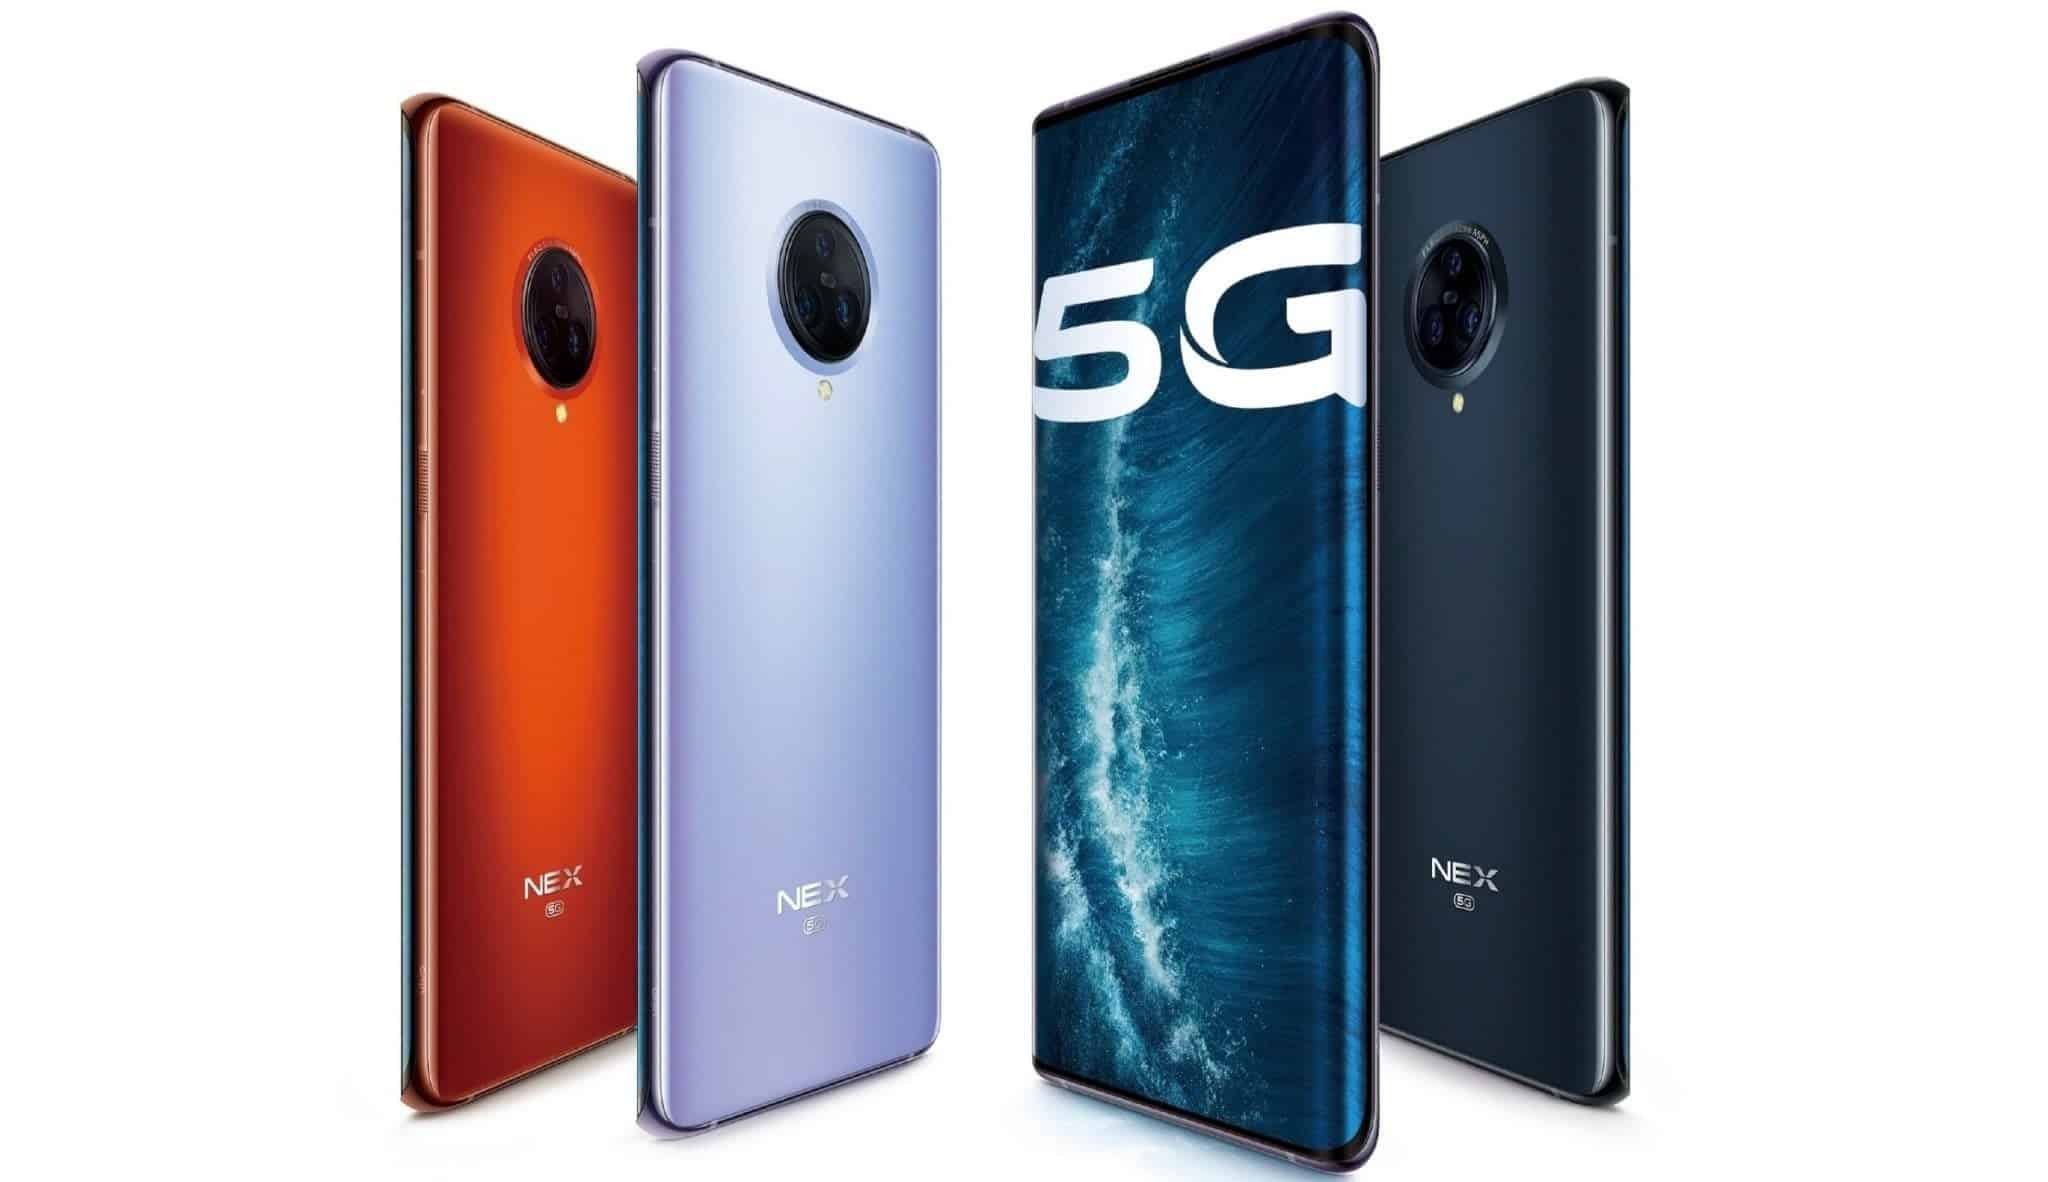 تسريبات : هاتف جديد قادم من VIVO يدعم 5G بمعالج سنابدركن 865